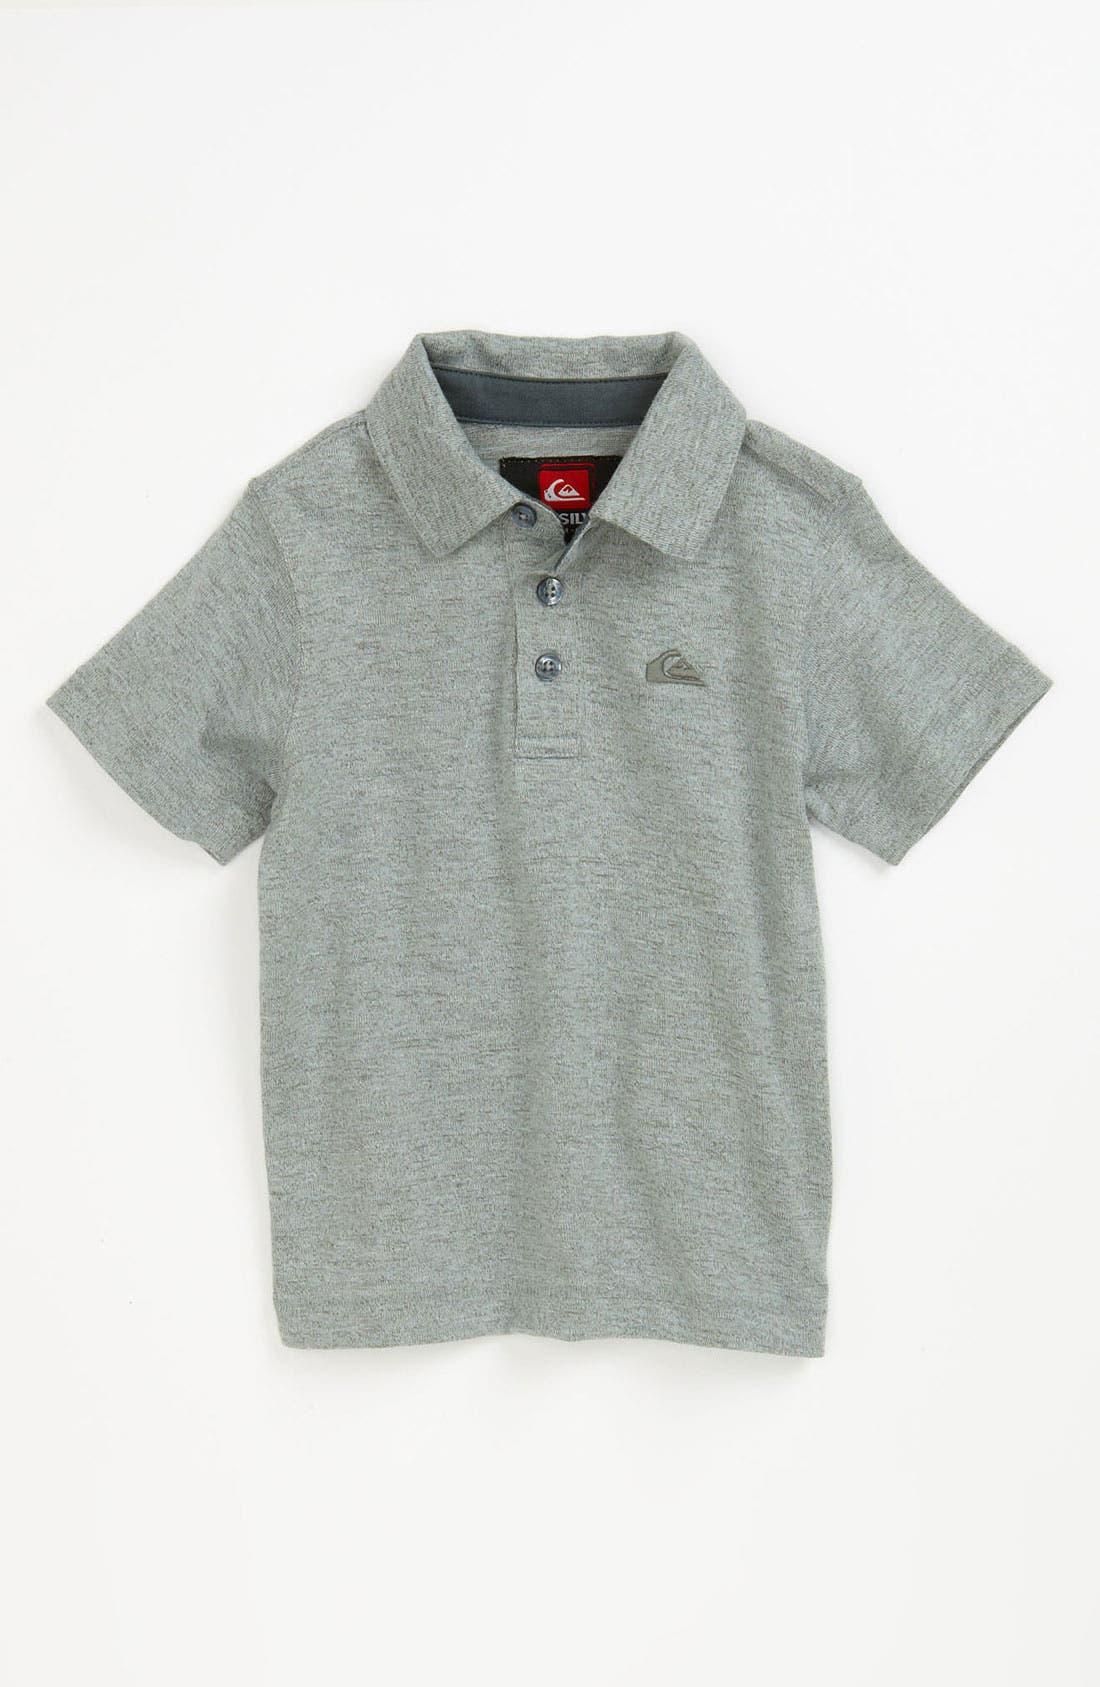 Alternate Image 1 Selected - Quiksilver 'Grab Bag' Polo Shirt (Baby)